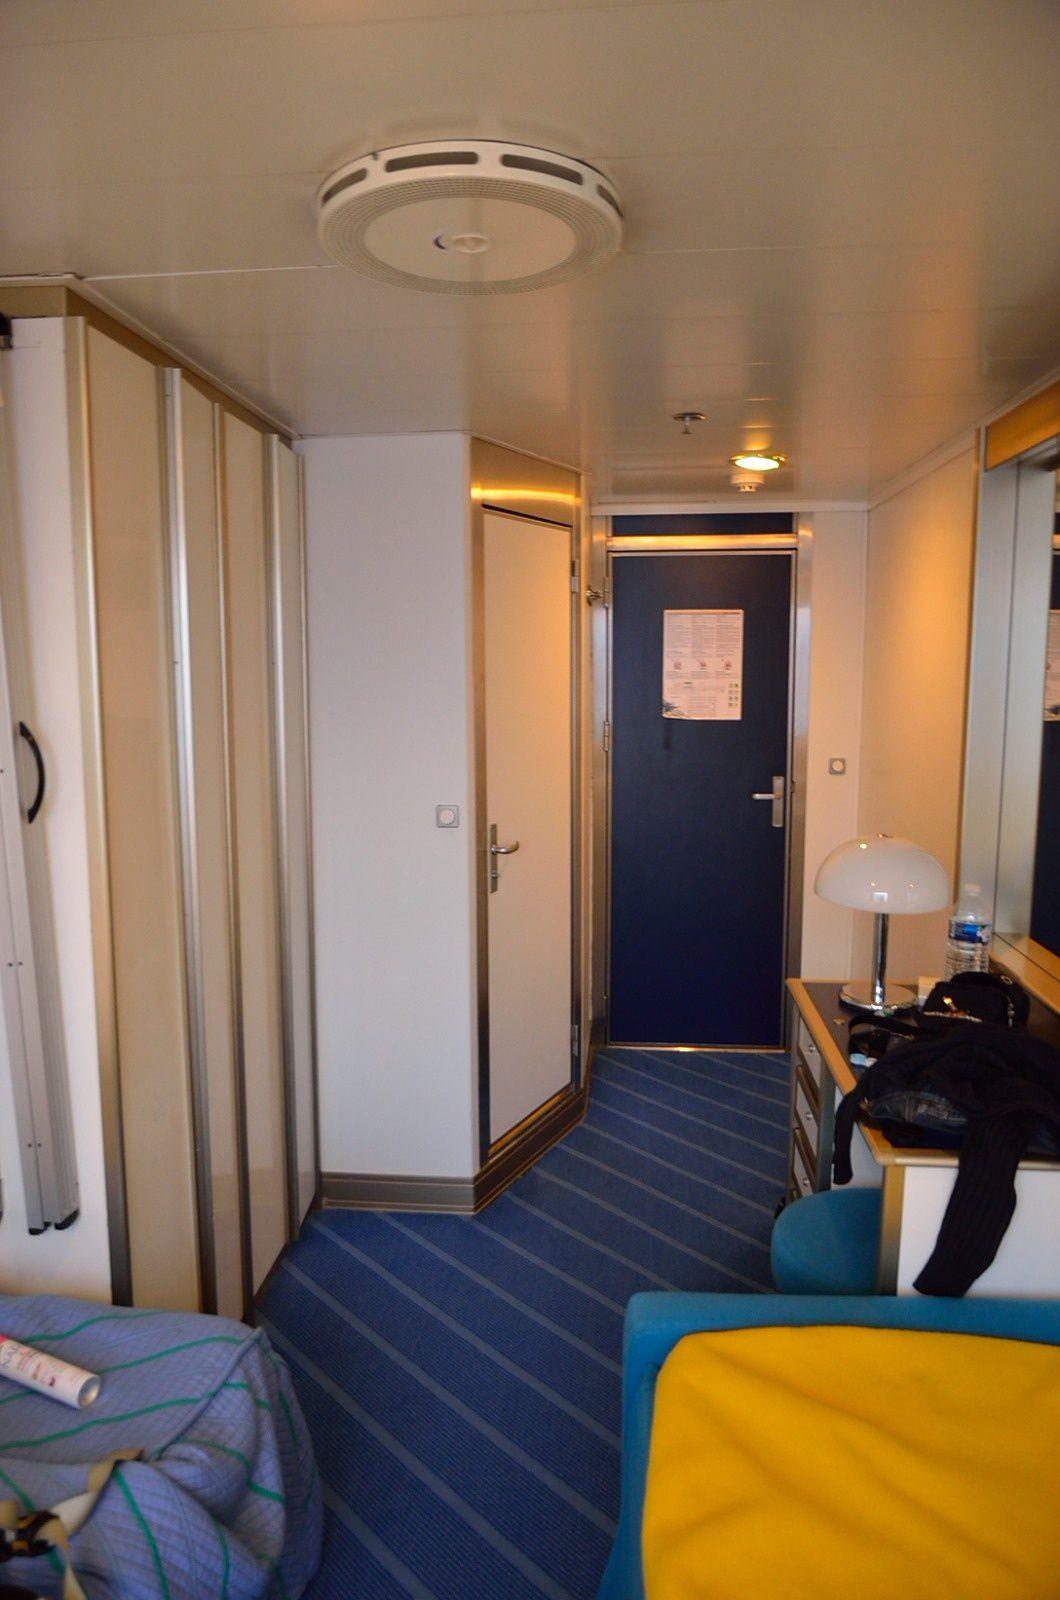 travers e toulon ajaccio avec corsica ferry damien dudognon mon blog photo randonn e. Black Bedroom Furniture Sets. Home Design Ideas